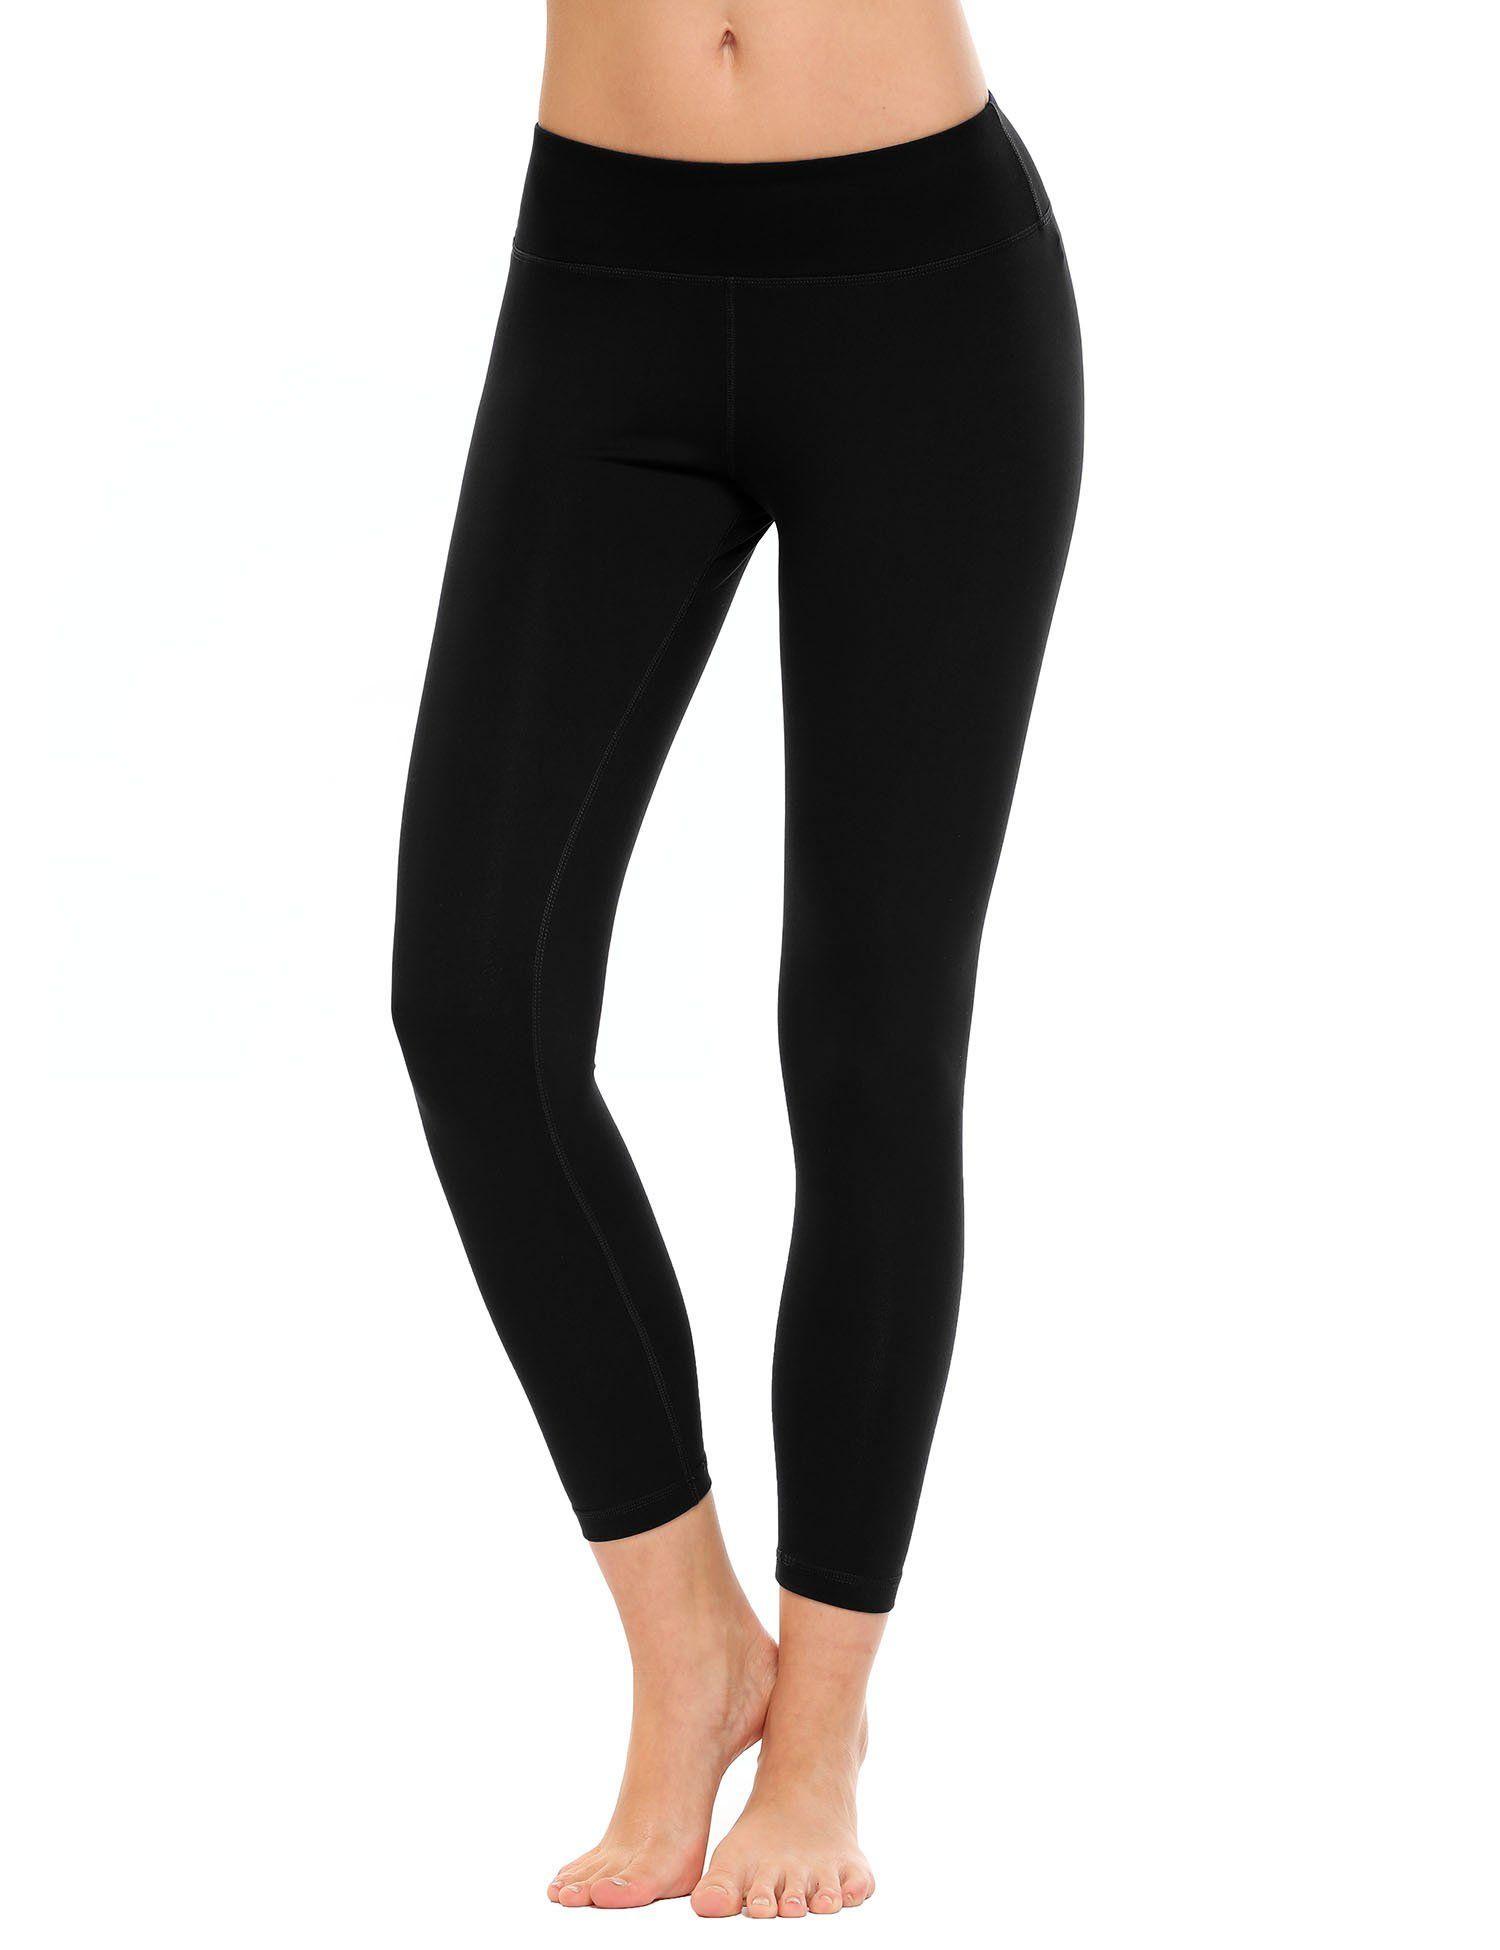 ebc82f52c53312 Ekouaer Women's Yoga Capris High Waist Tummy Control Shapewear Pants  Leggings. Good Fabric--